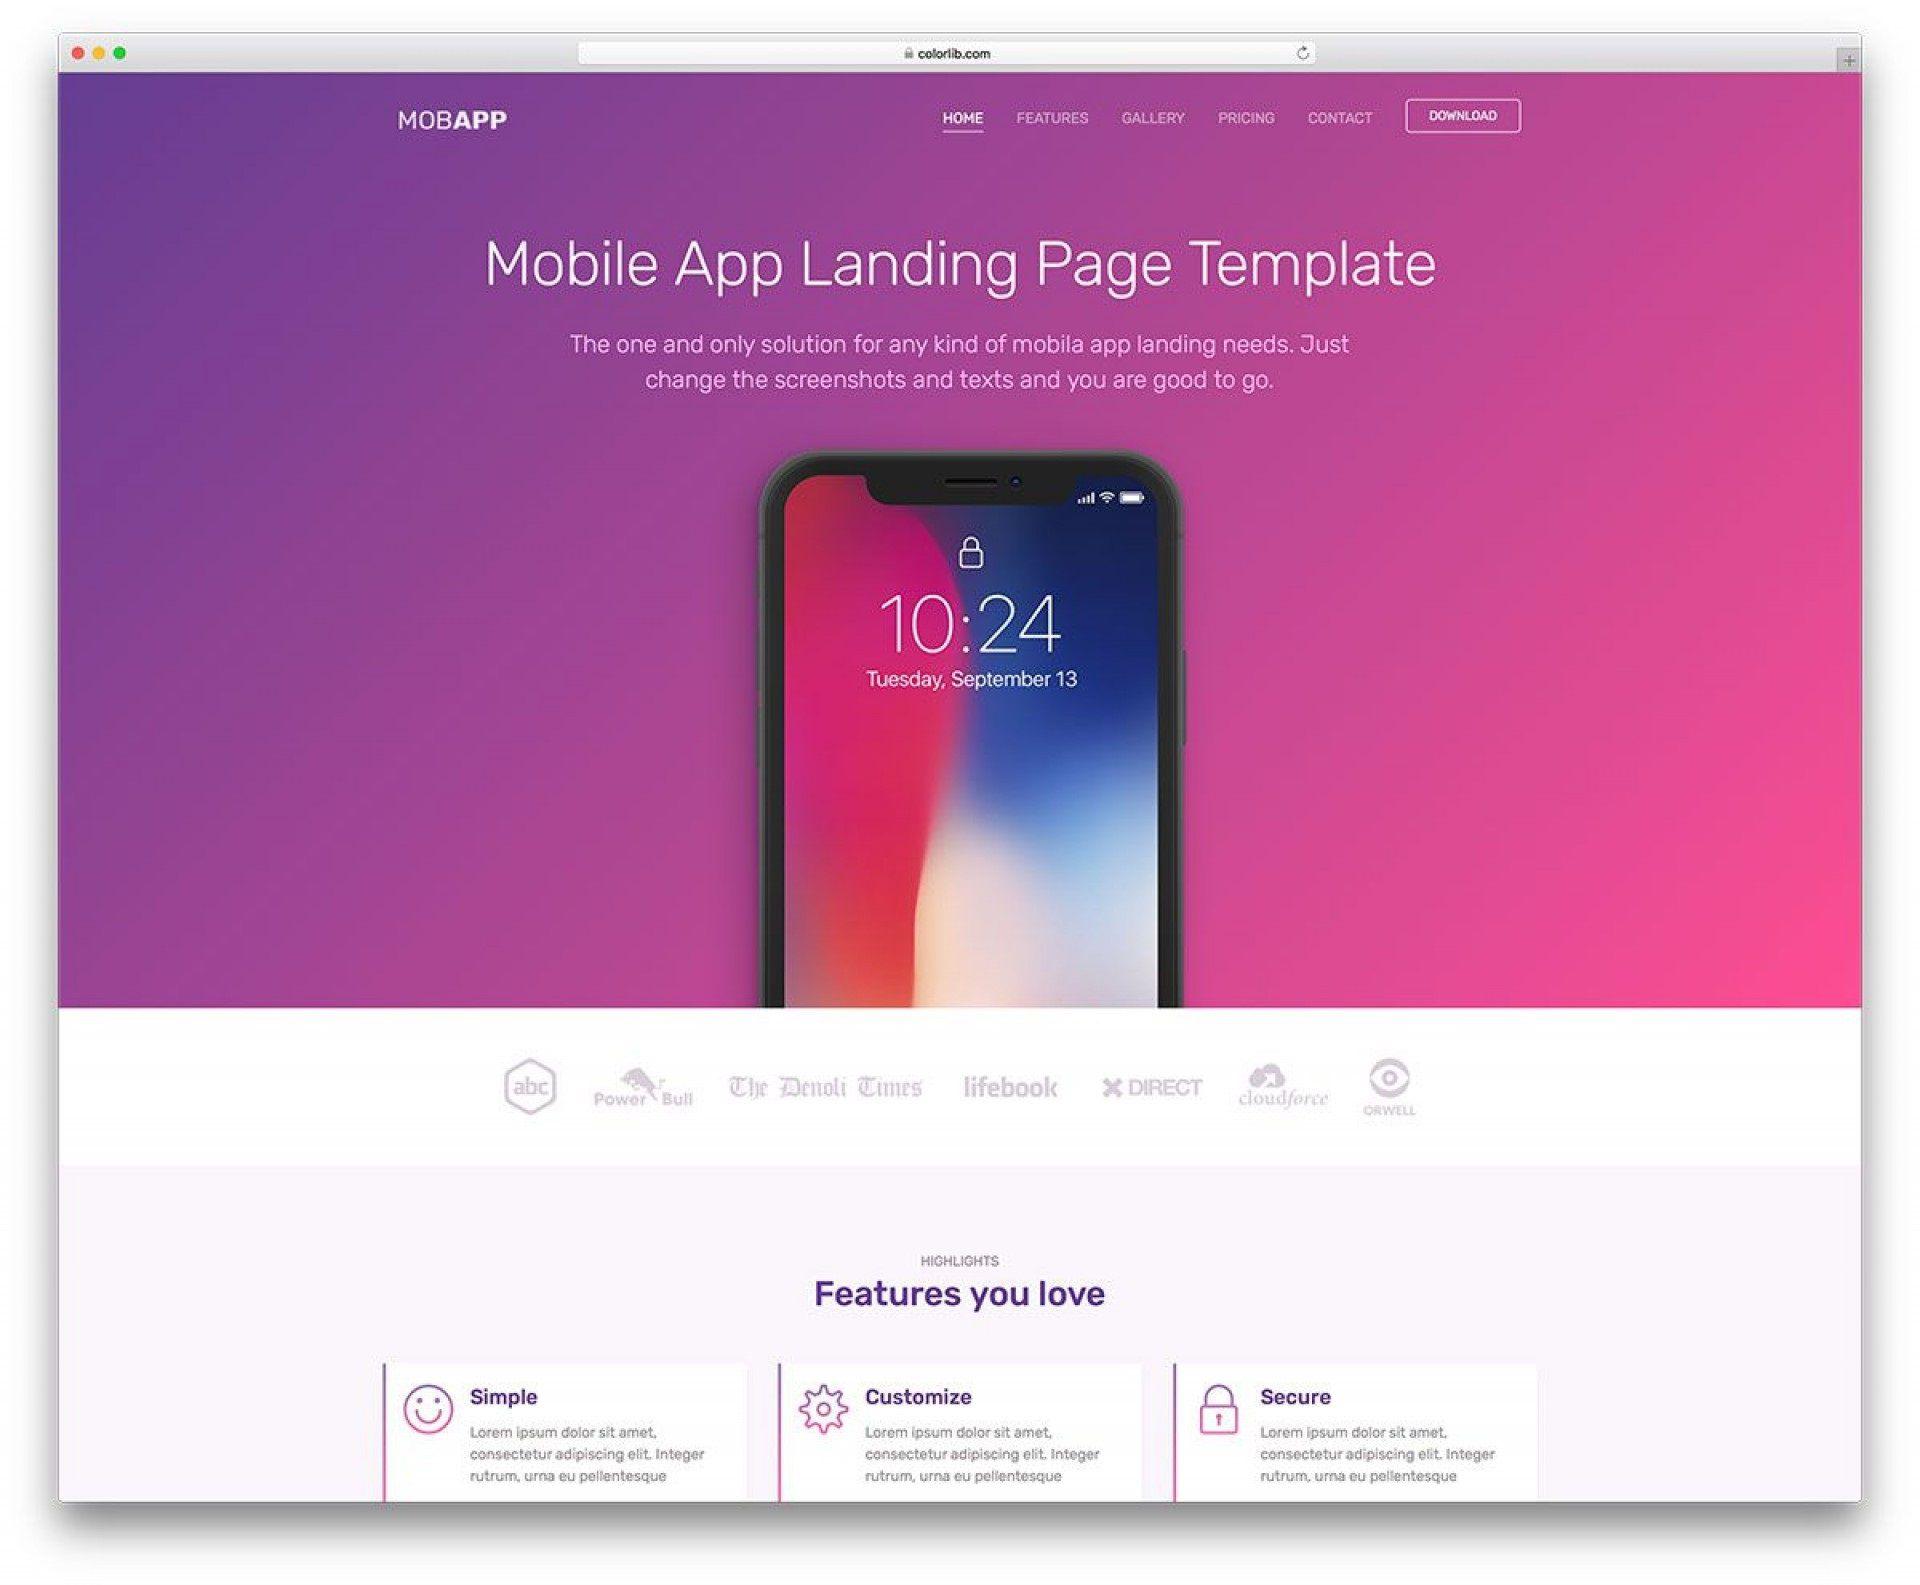 009 Unforgettable Csvape Esponsive Mobile App Landing Page Html Template Free Download Design  Csvape-responsive-mobile-app-landing-page-html-templateFull